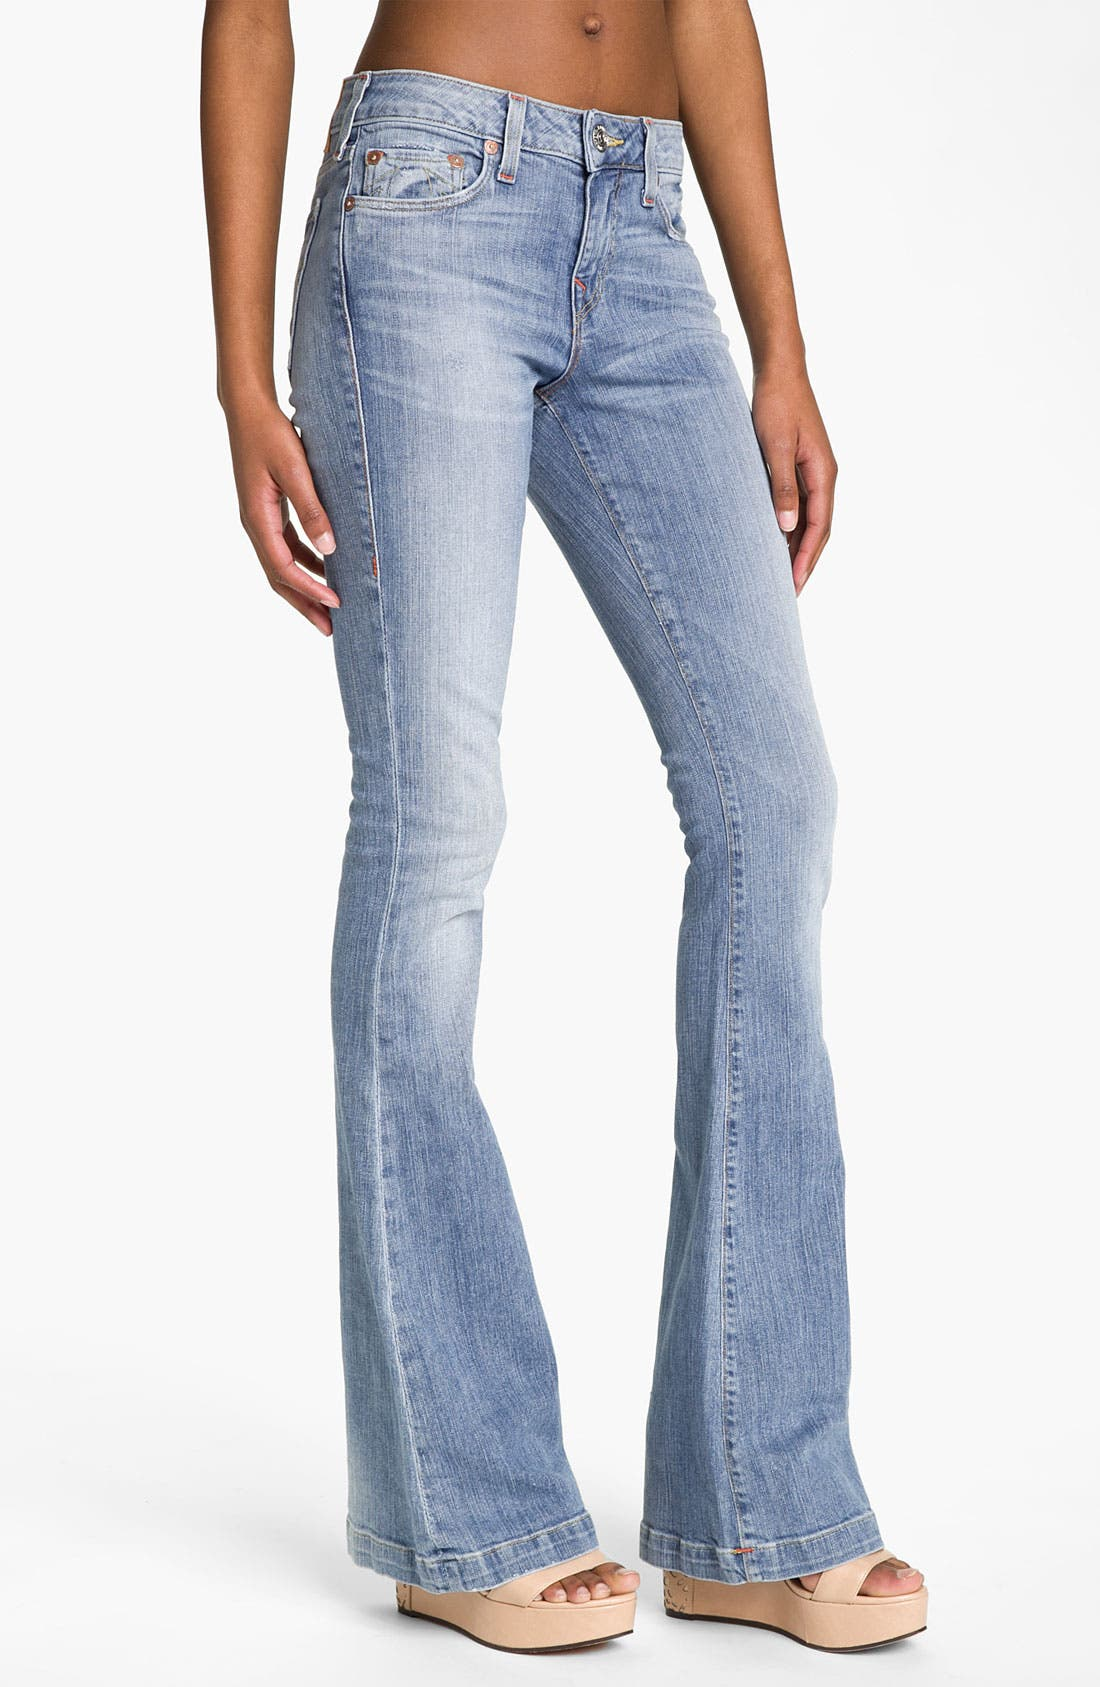 Main Image - True Religion Brand Jeans 'Emi'' Distressed Flare Leg Jeans (Medium Drifter)